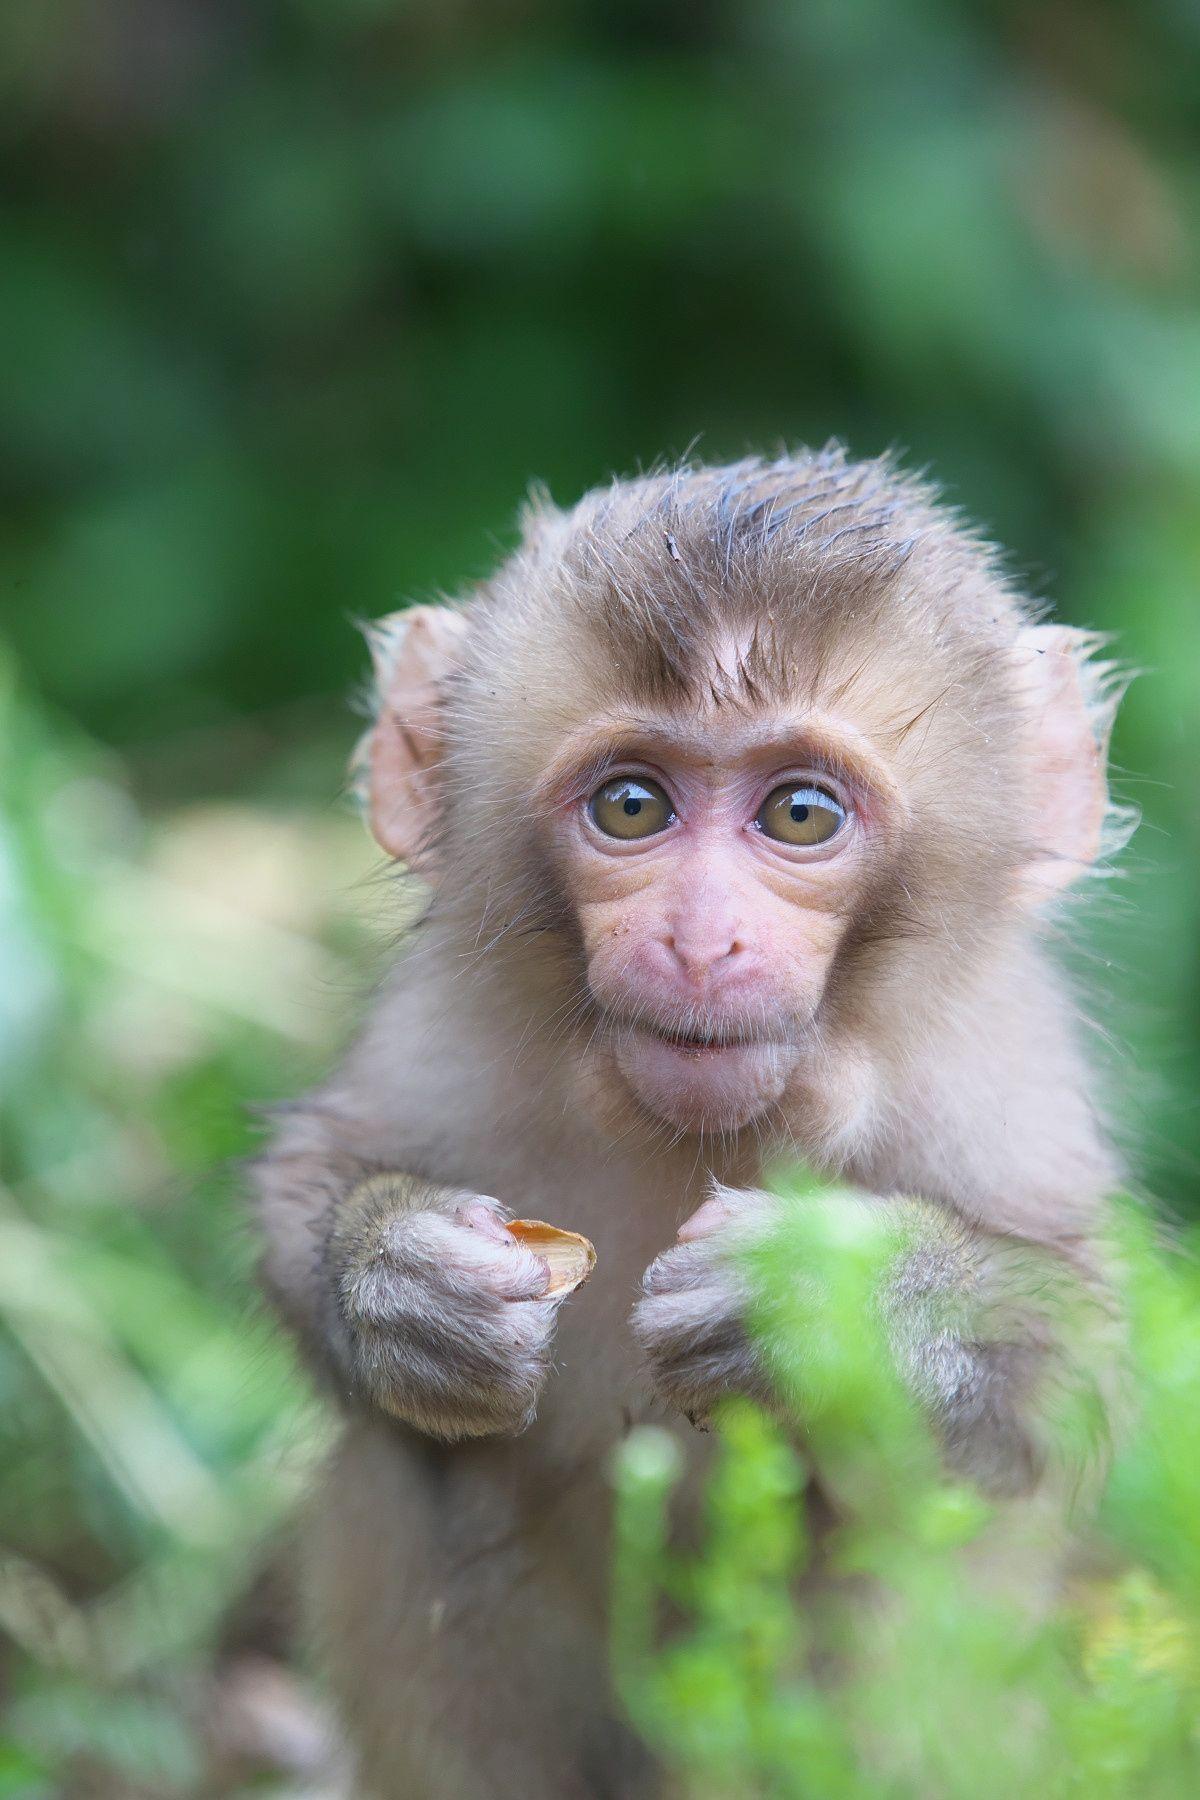 Sweet Baby Jigokudani Monkey Park in 2020